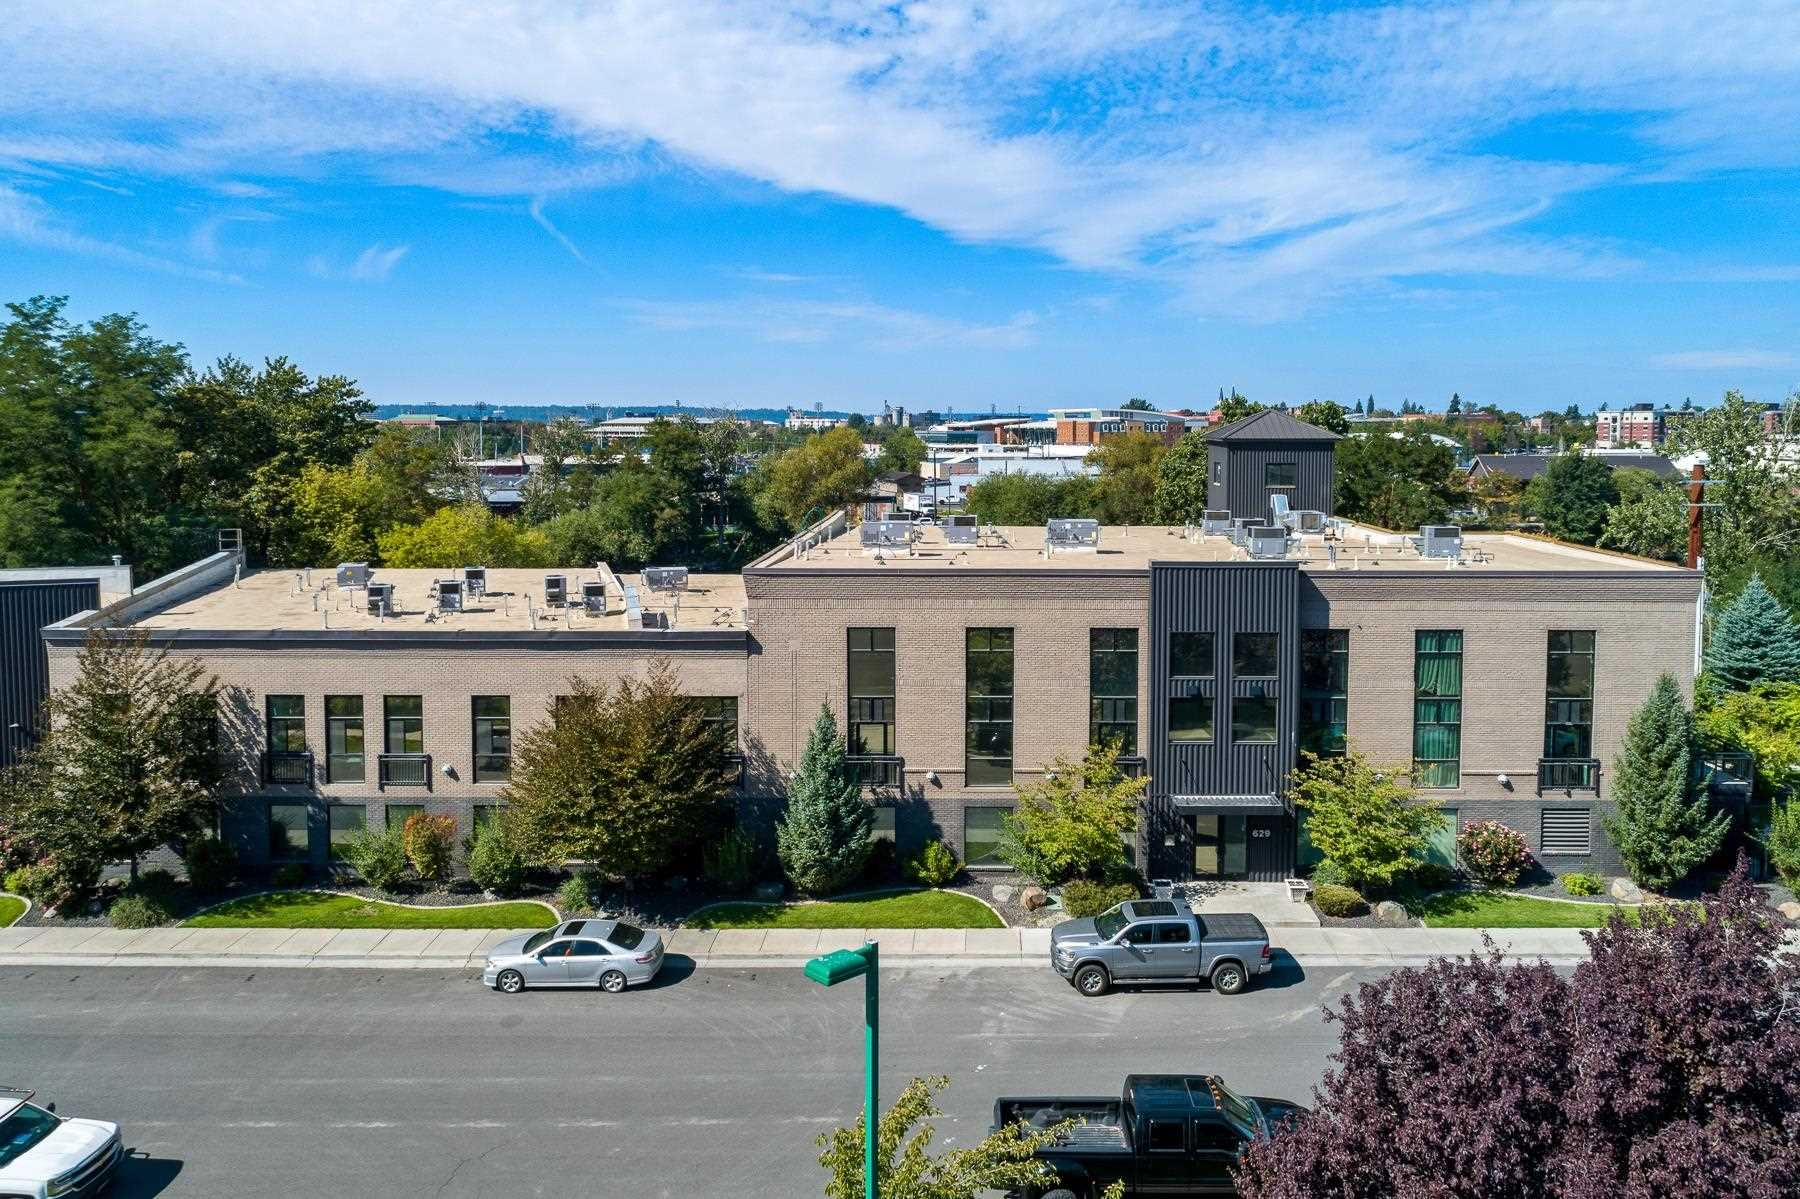 Photo of 629 N Iron Ct #113, Spokane, WA 99202 (MLS # 202122459)